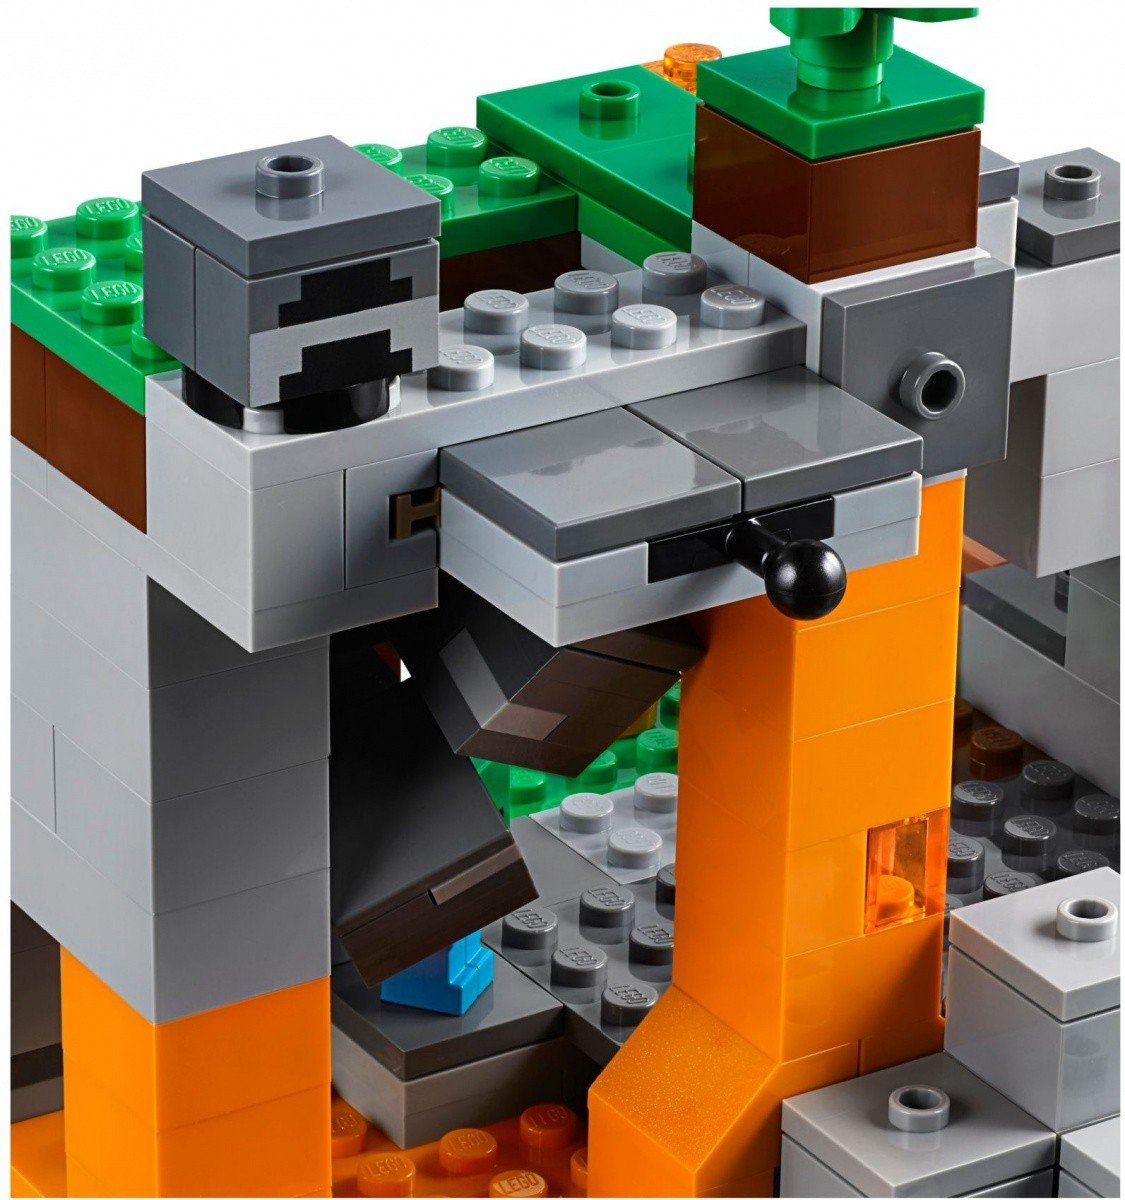 7922a03e3 LEGO MINECRAFT JASKINIA ZOMBIE 21141 7+ - Minecraft - LEGO - Malako ...